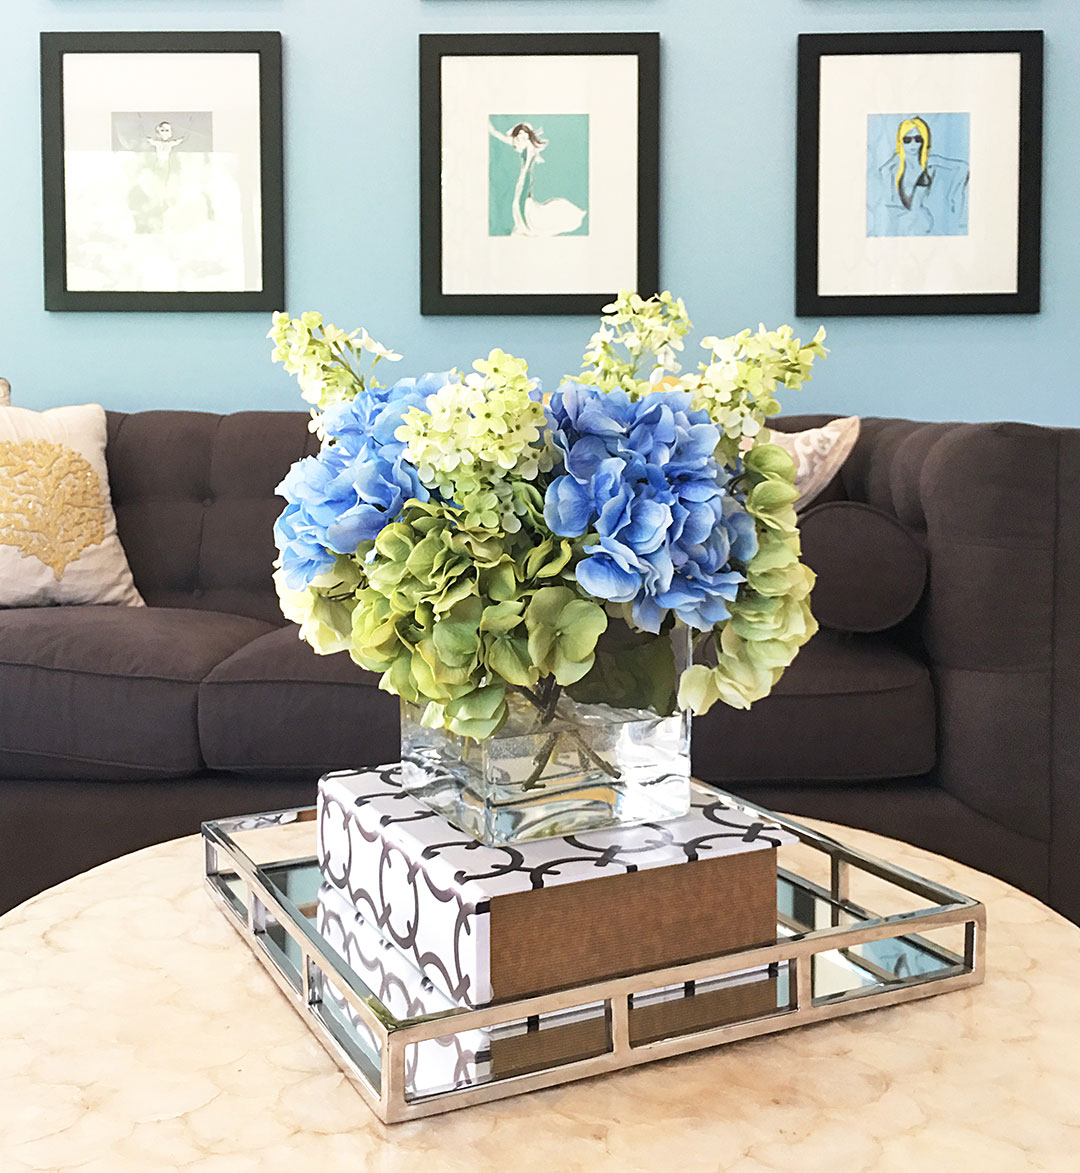 family-room-hydrangeas-blue-and-greem